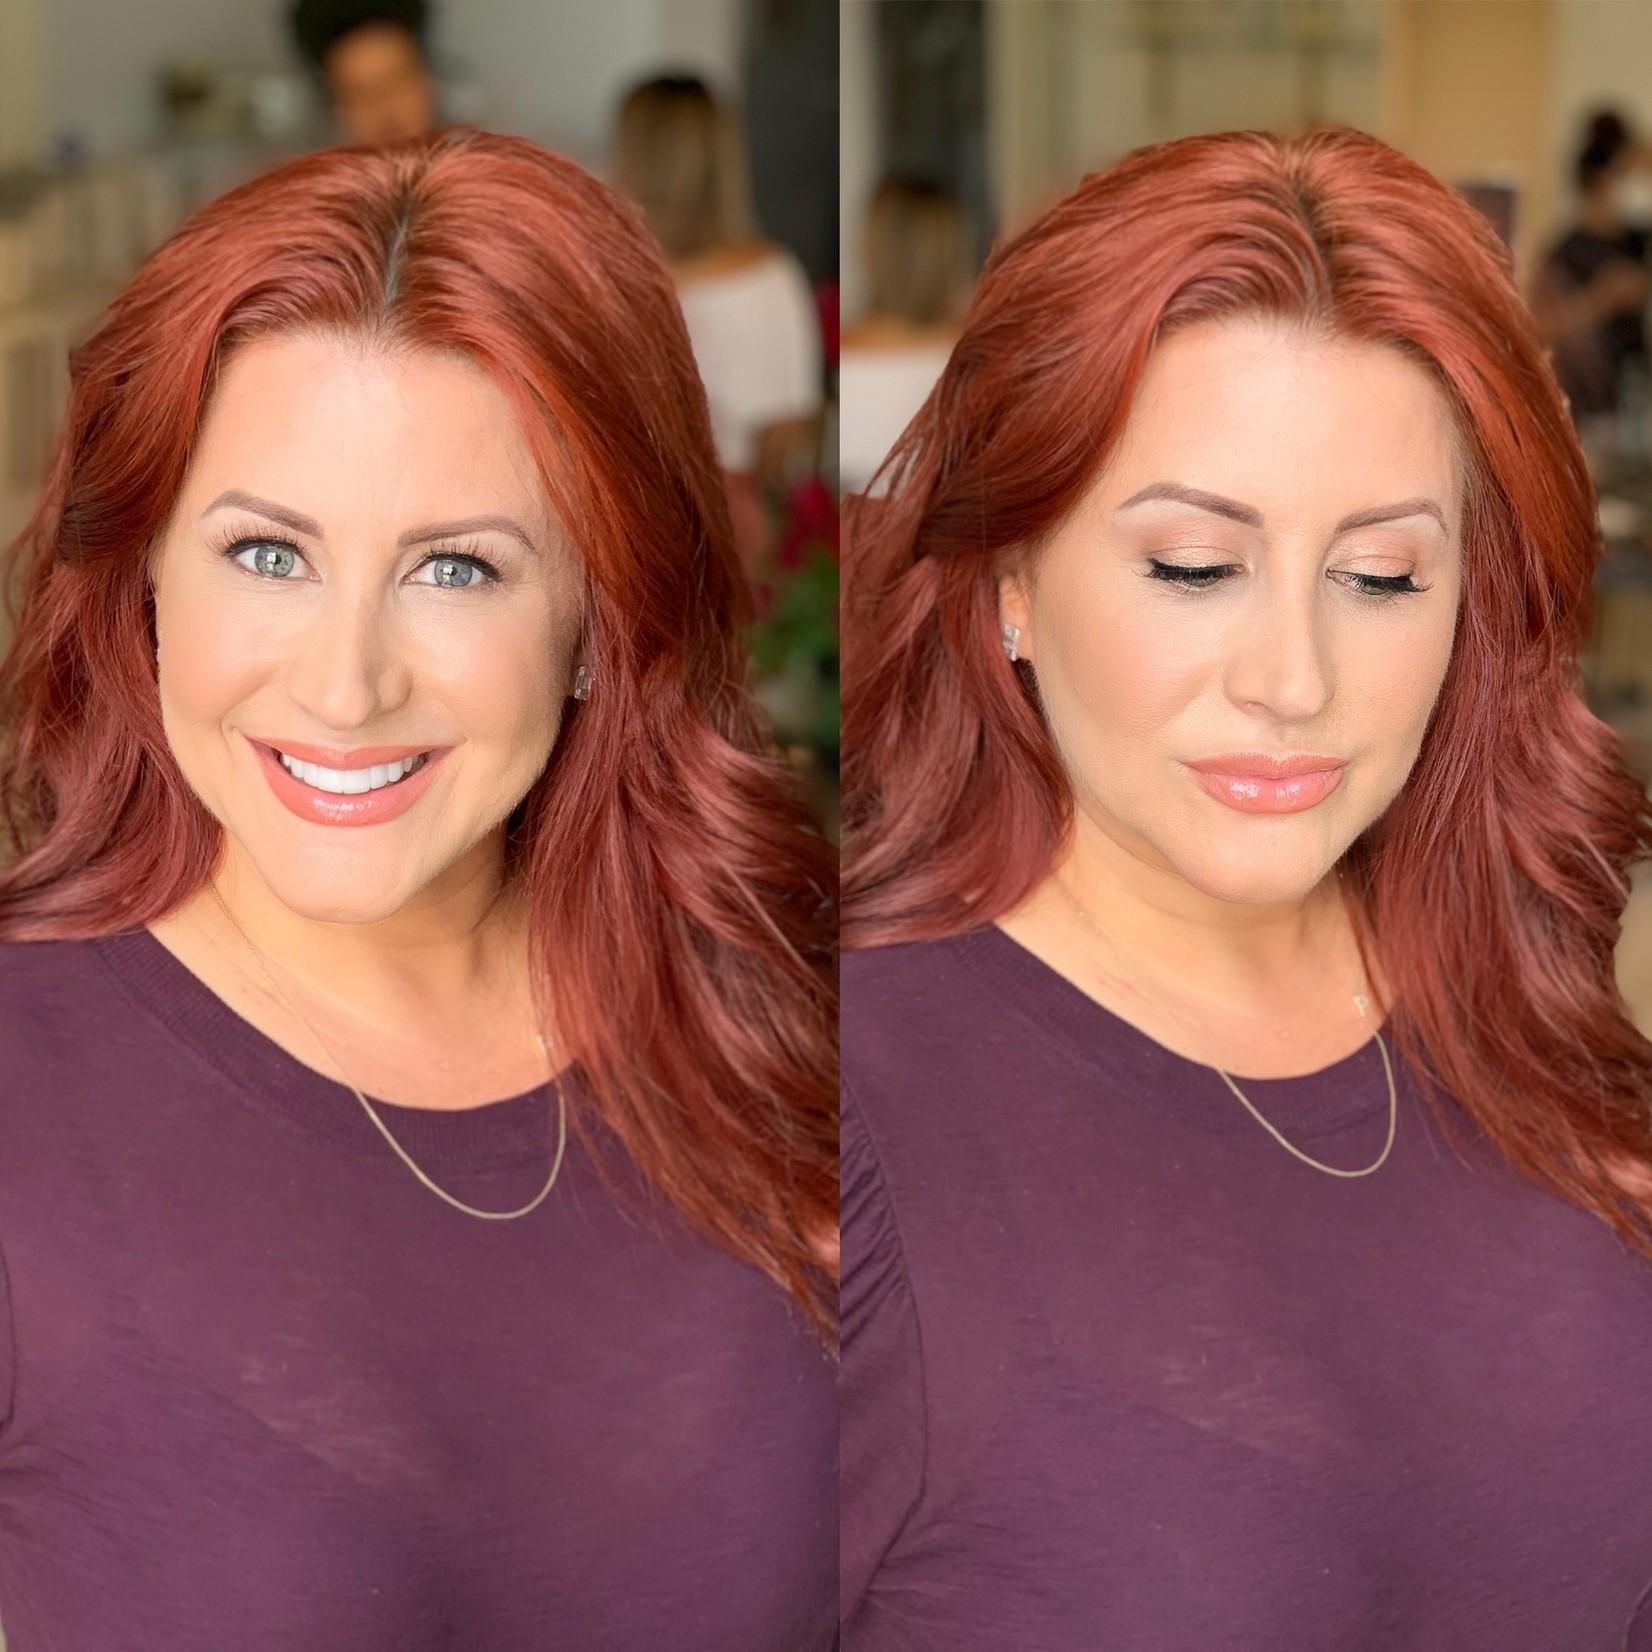 JKC SHOP BY EYE  - Auburn/Red Hair + Blue Eyes